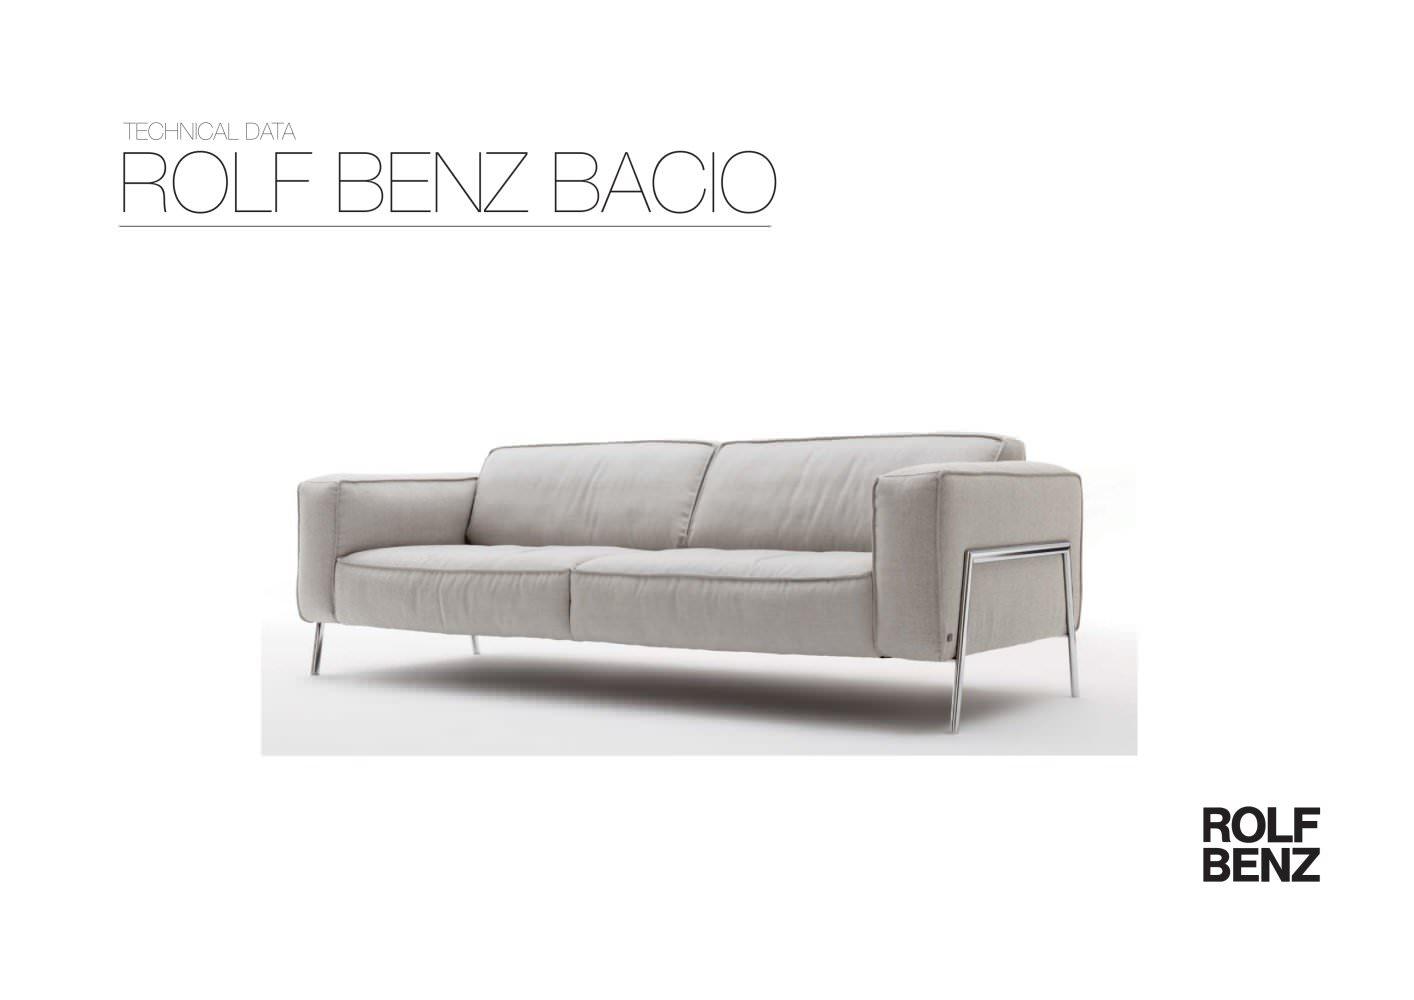 Rolf Benz Bacio